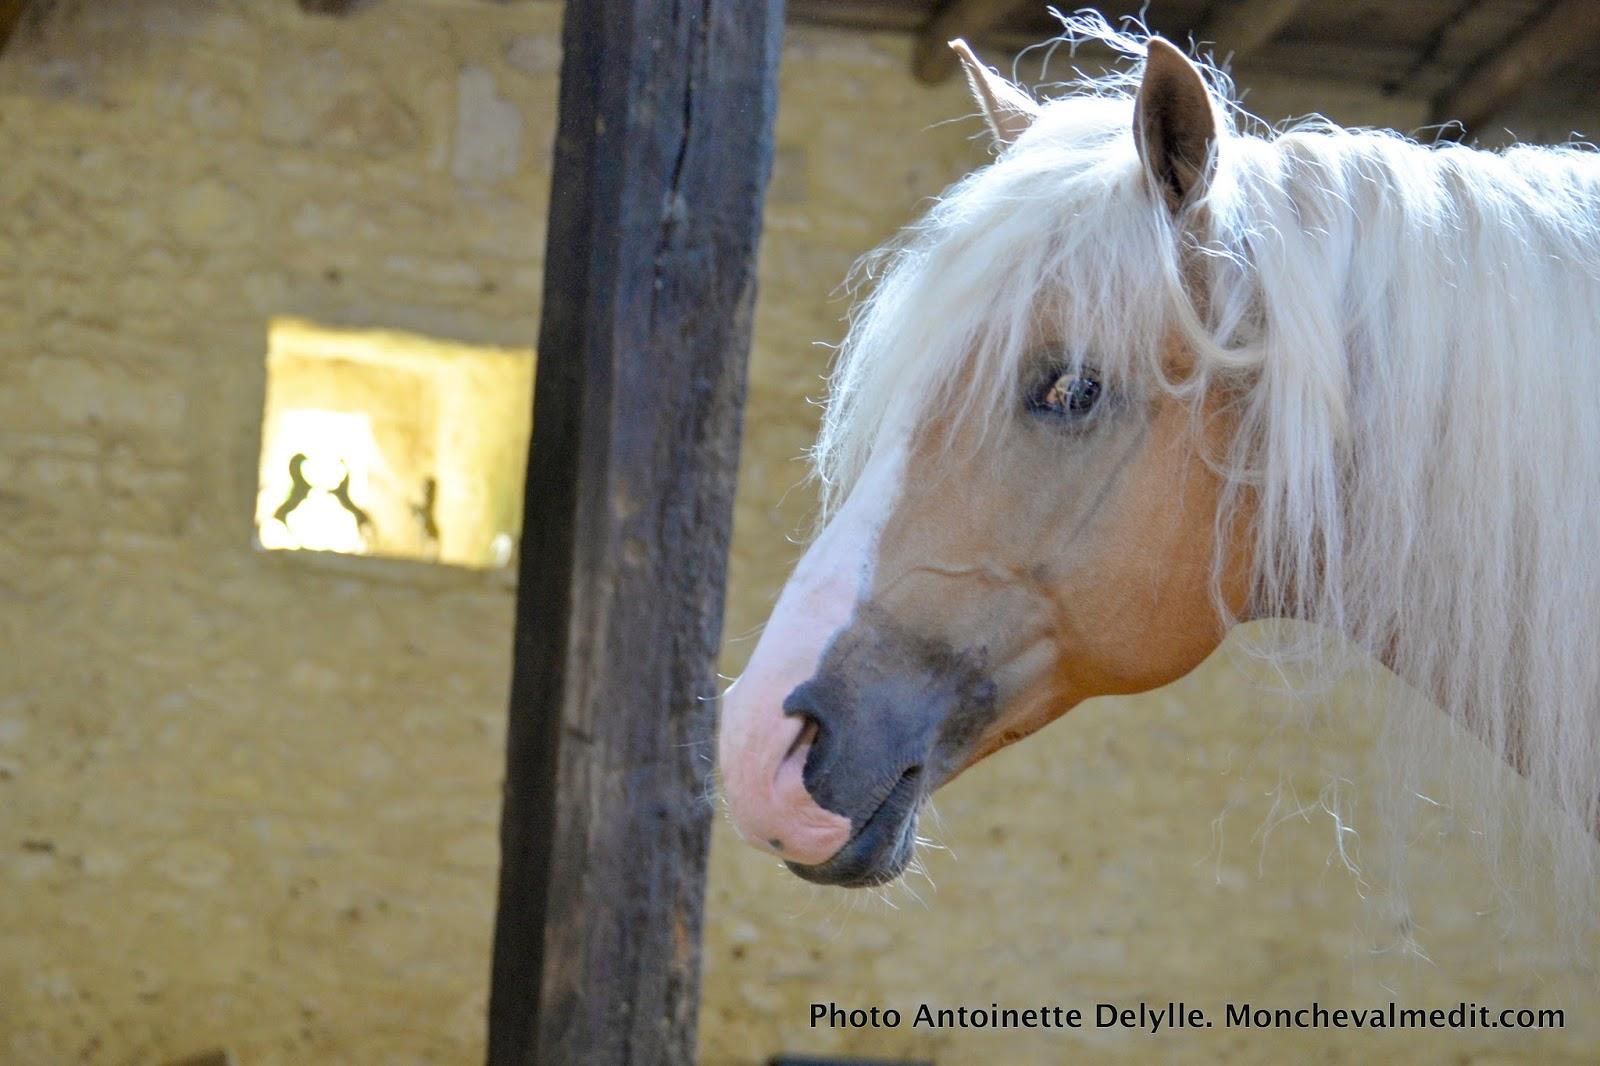 Mon cheval me dit le cheval rebelle peint par liska - Cheval rebelle ...